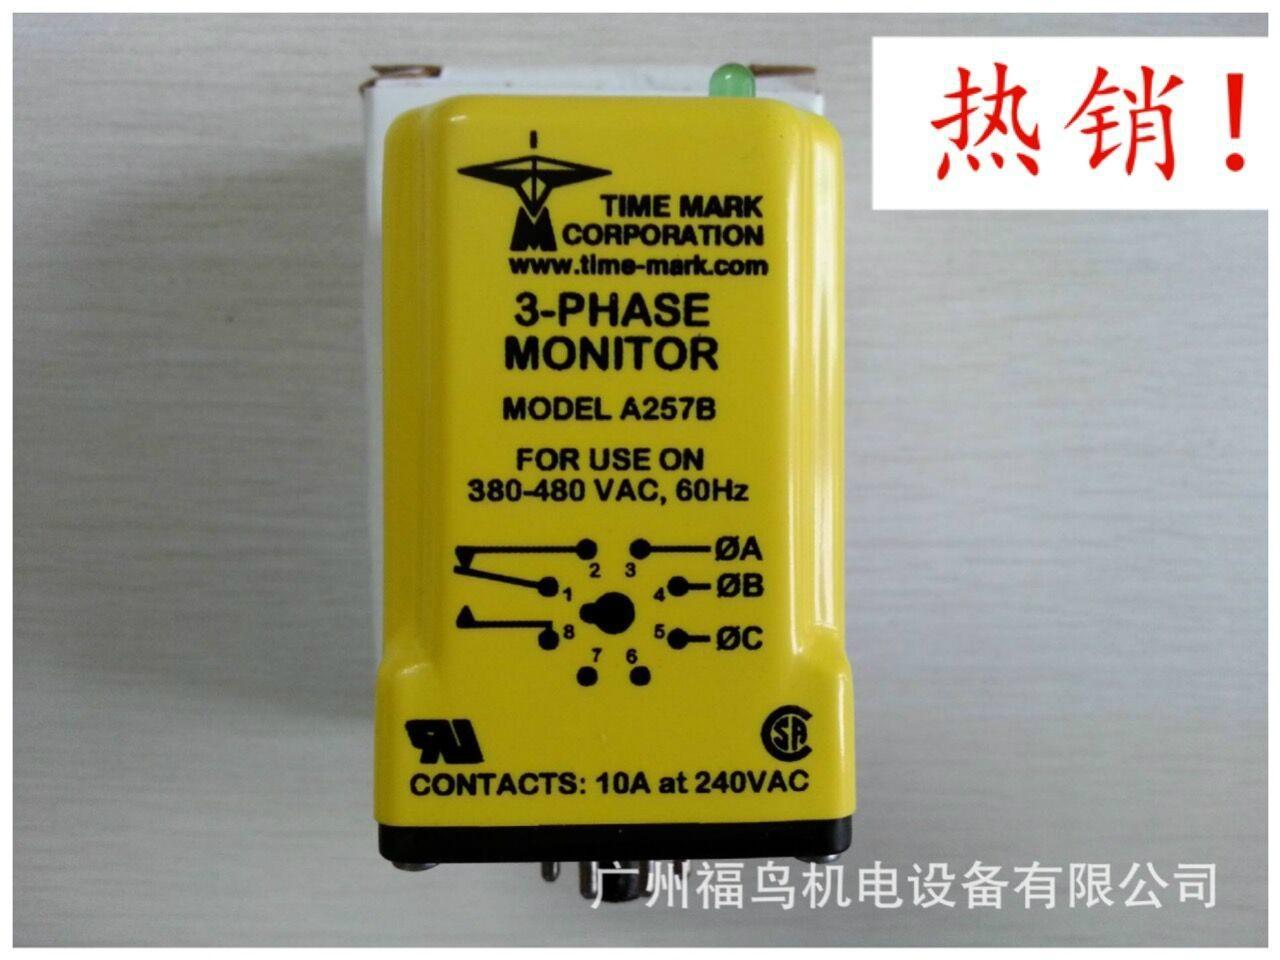 TIME MARK相序檢測器, 三相監控器, 型號: A257B